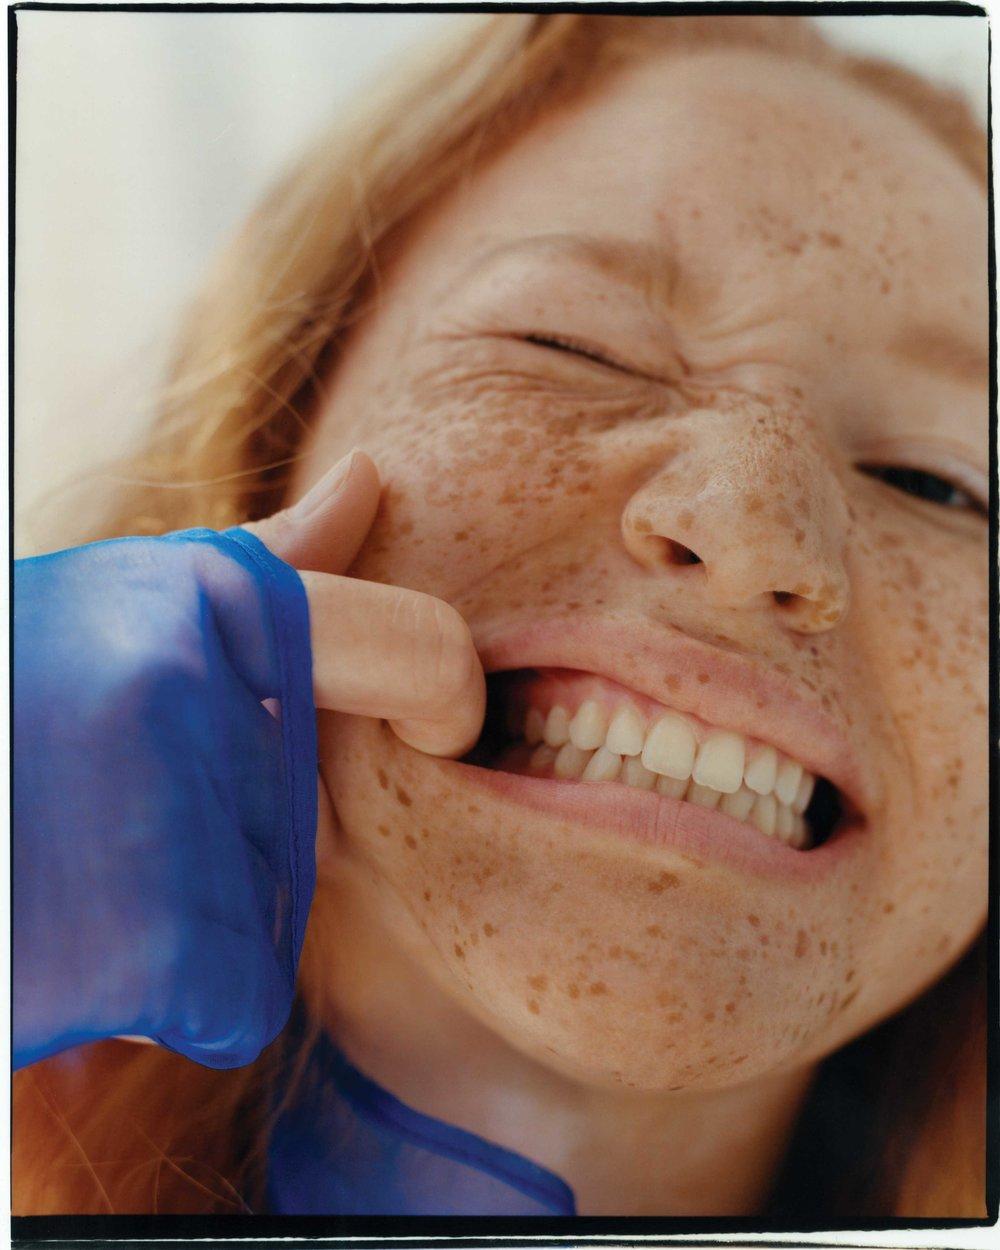 Allure-Lips-Jens-Ingvarsson-Tehya-002.jpg